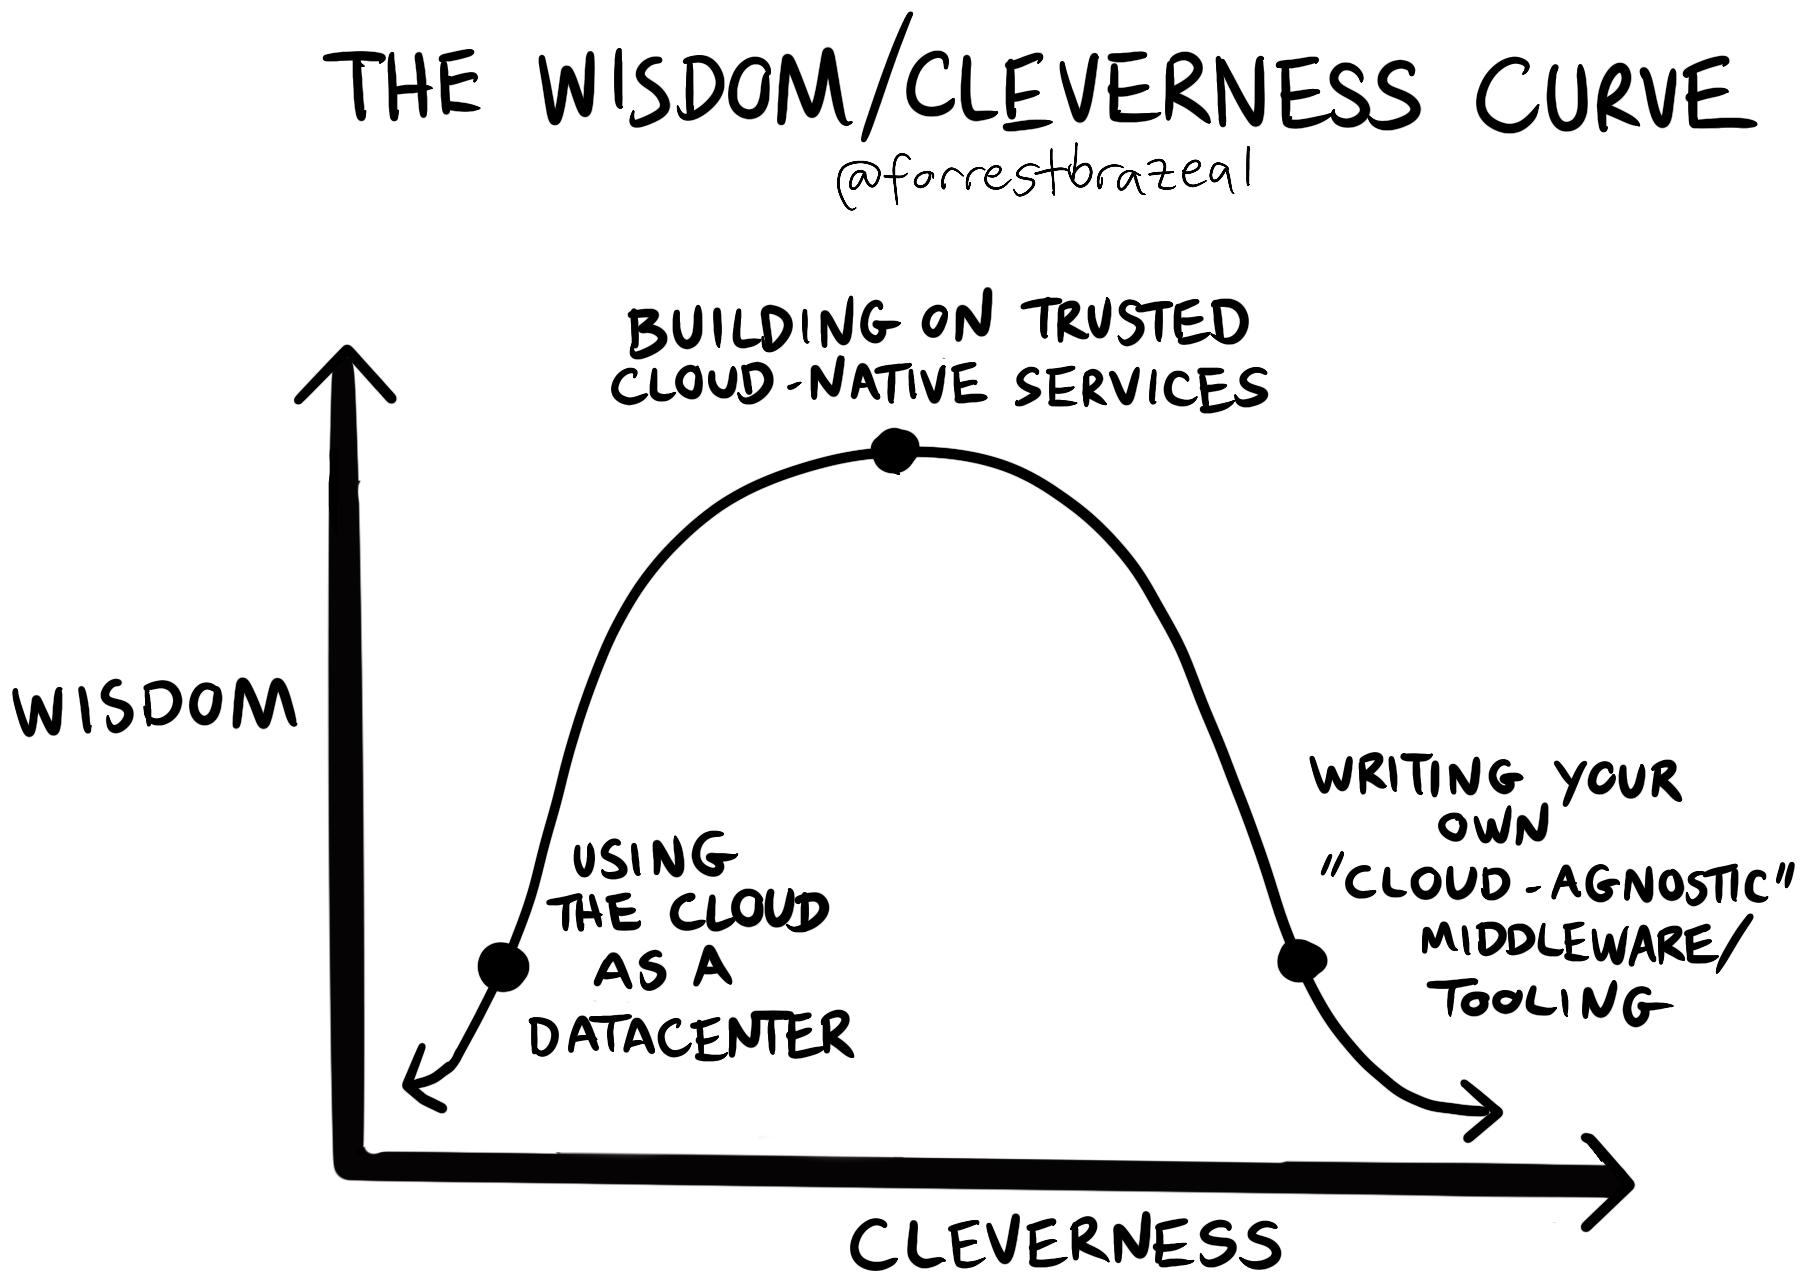 wisdom/cleverness curve